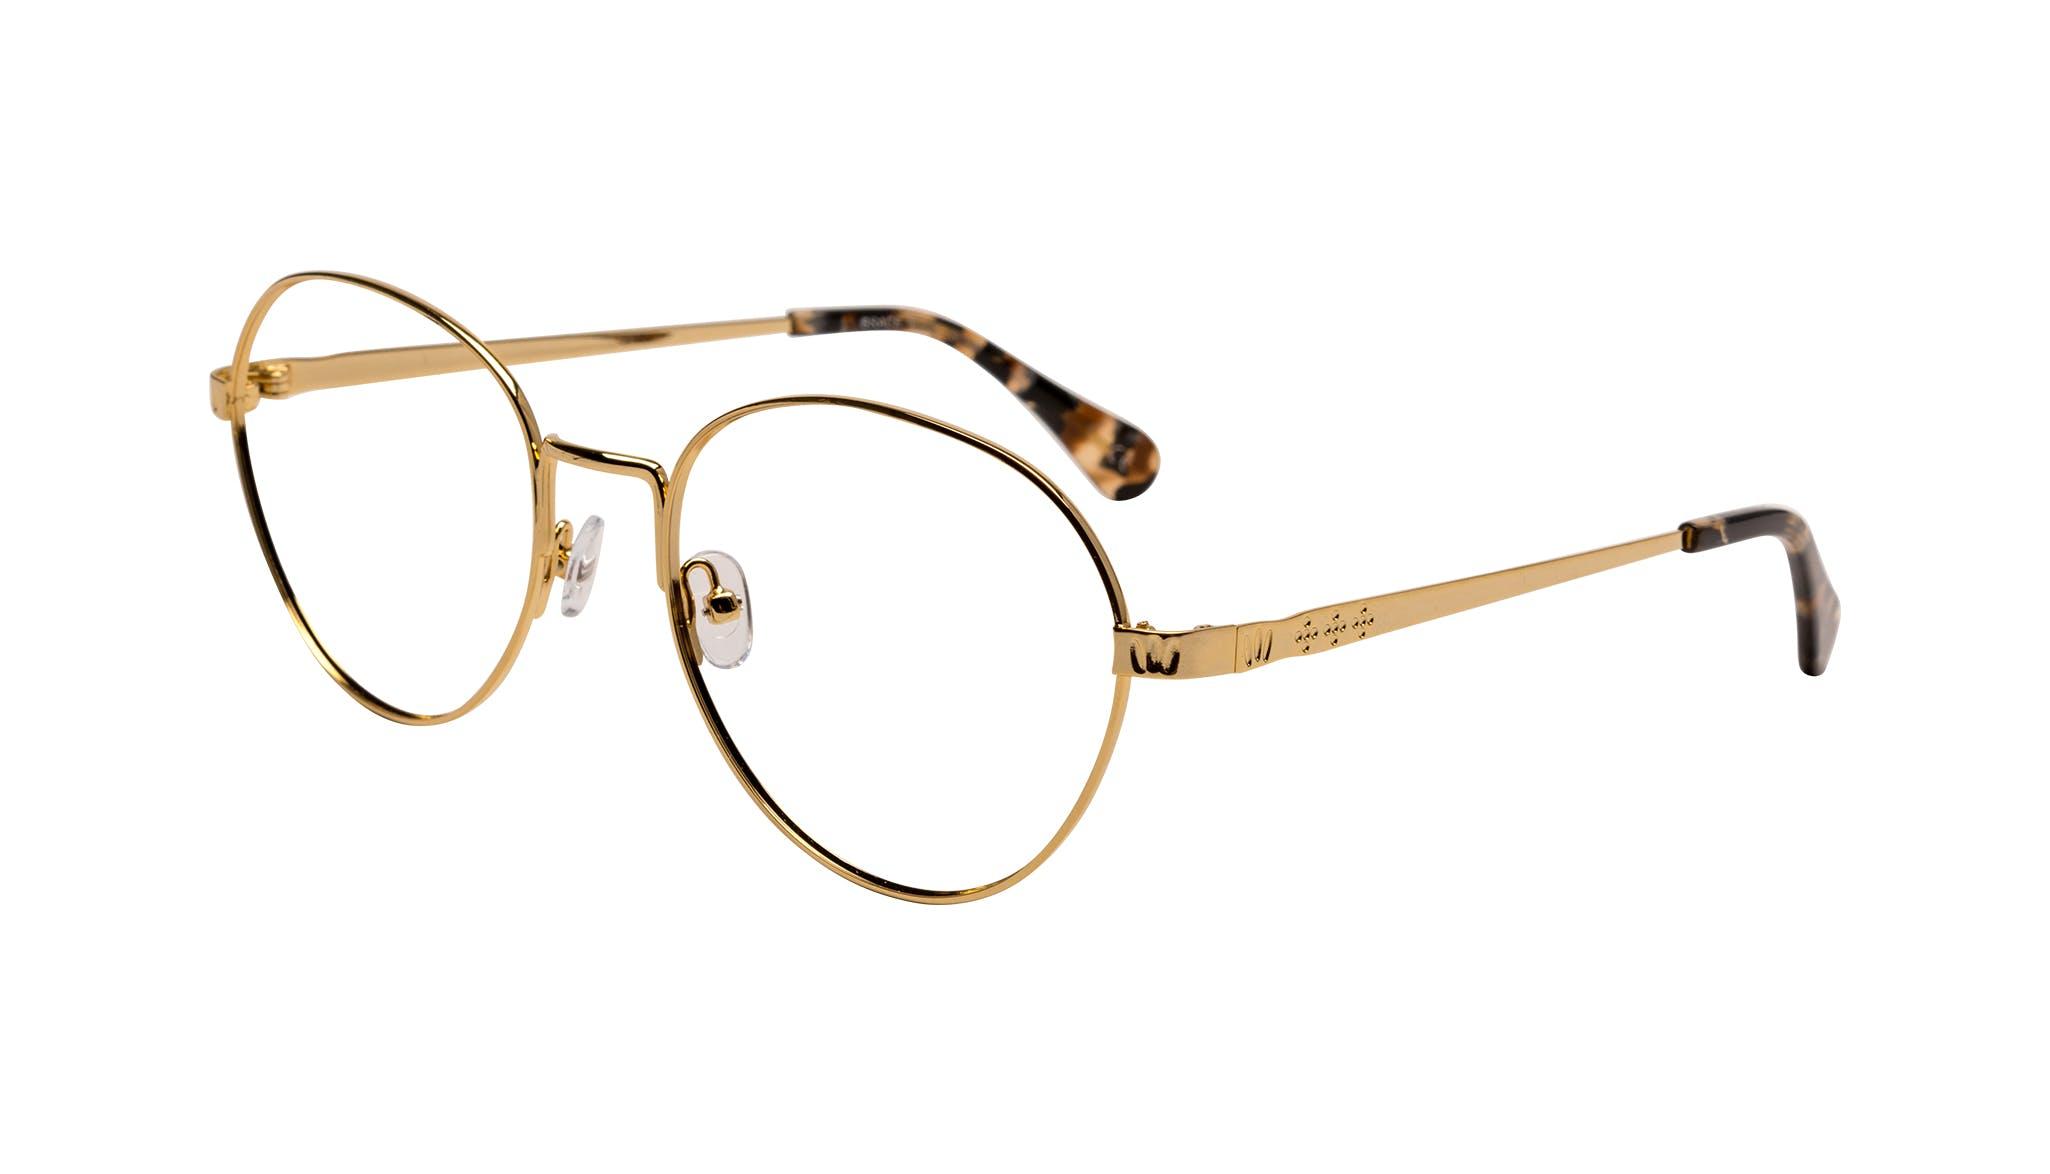 Affordable Fashion Glasses Round Eyeglasses Women Brace Plus Gold Tilt